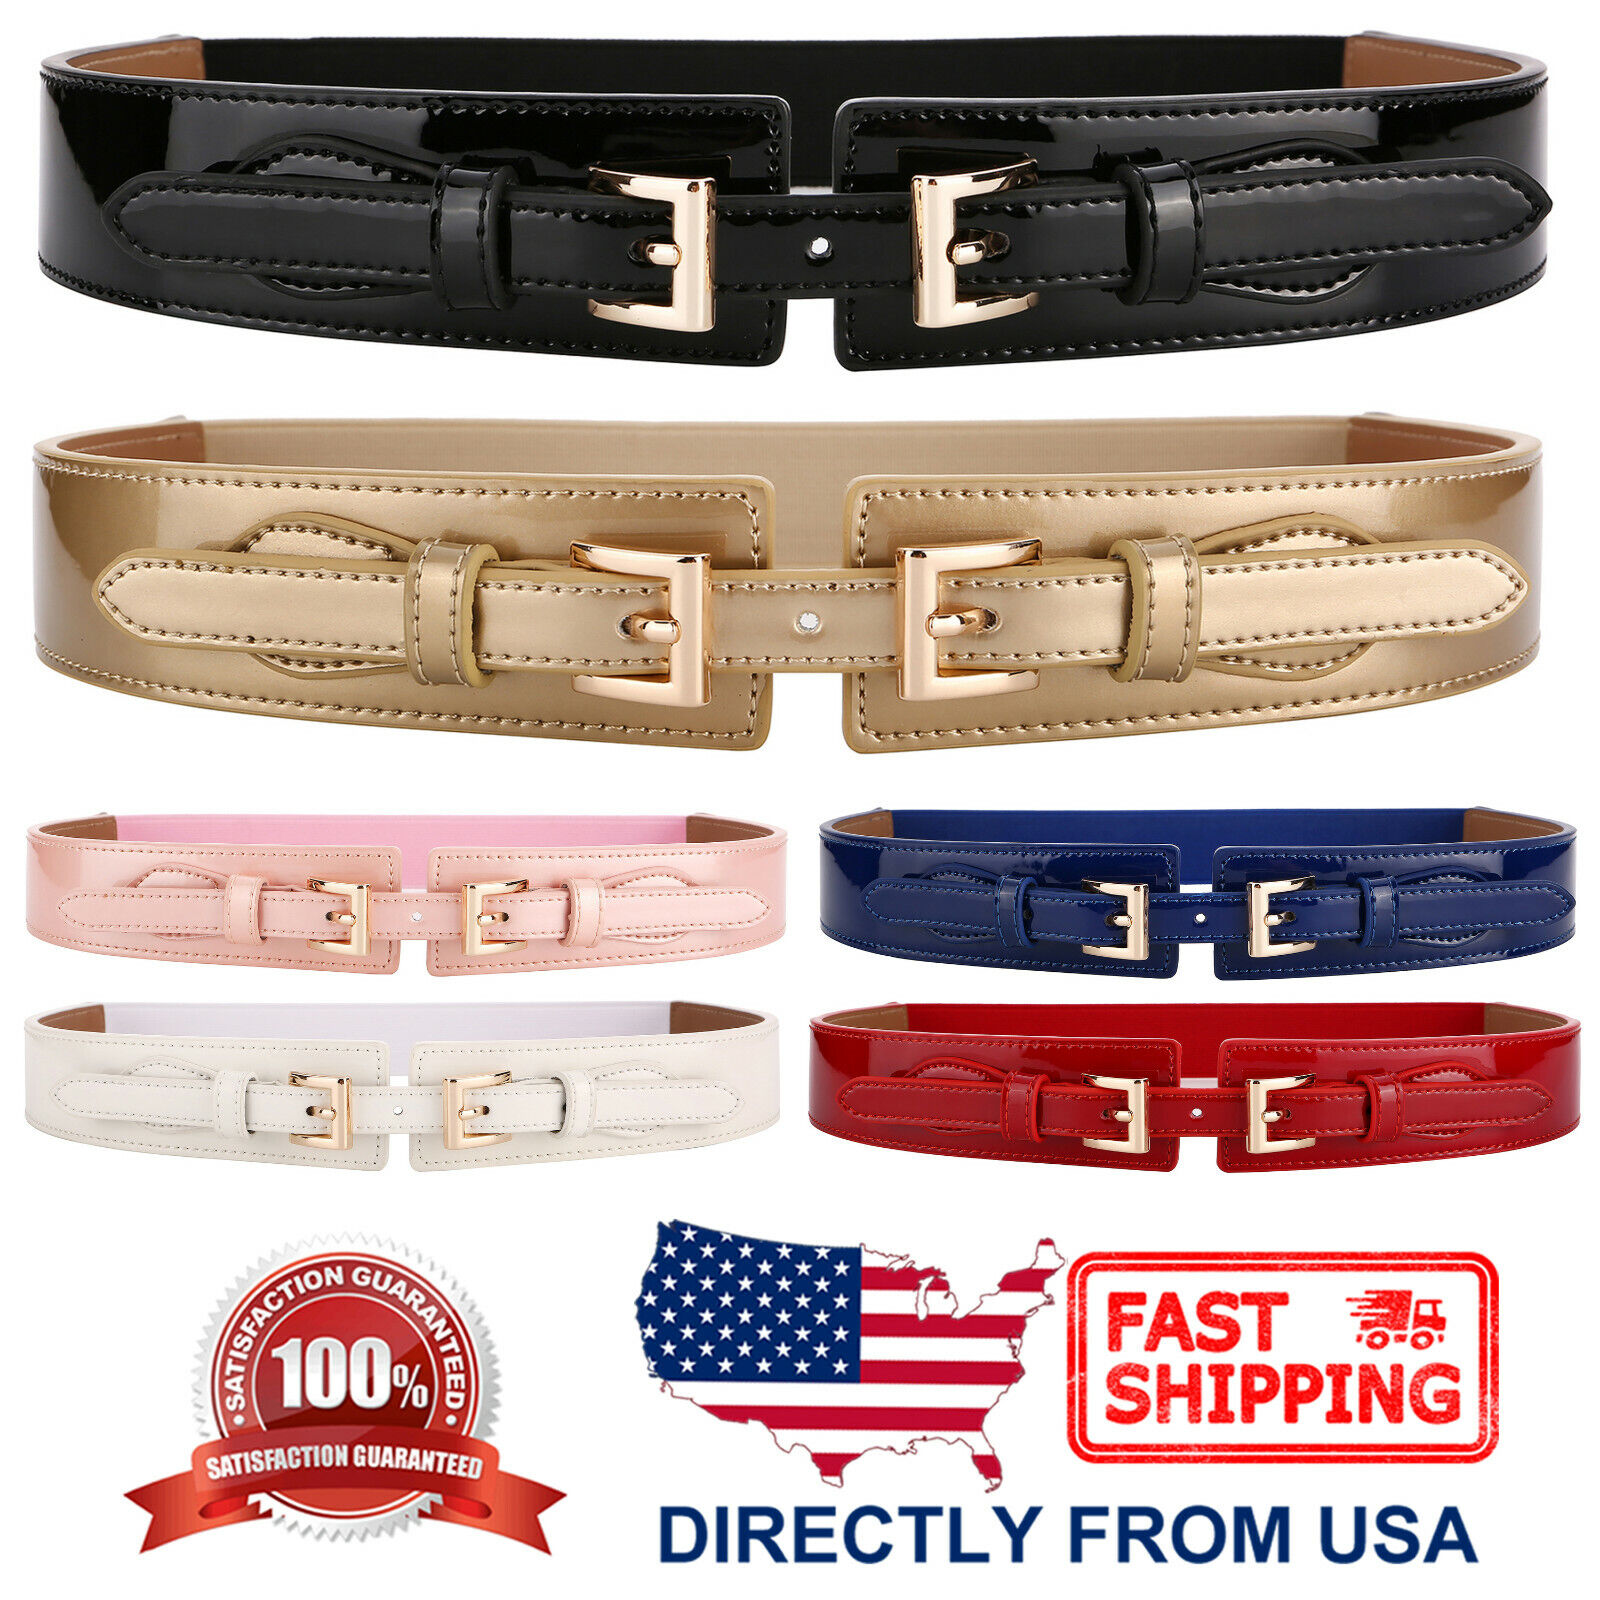 Women's Waist Belt Shiny Patent Leather Elastic Stretch Cinch Belt Belts